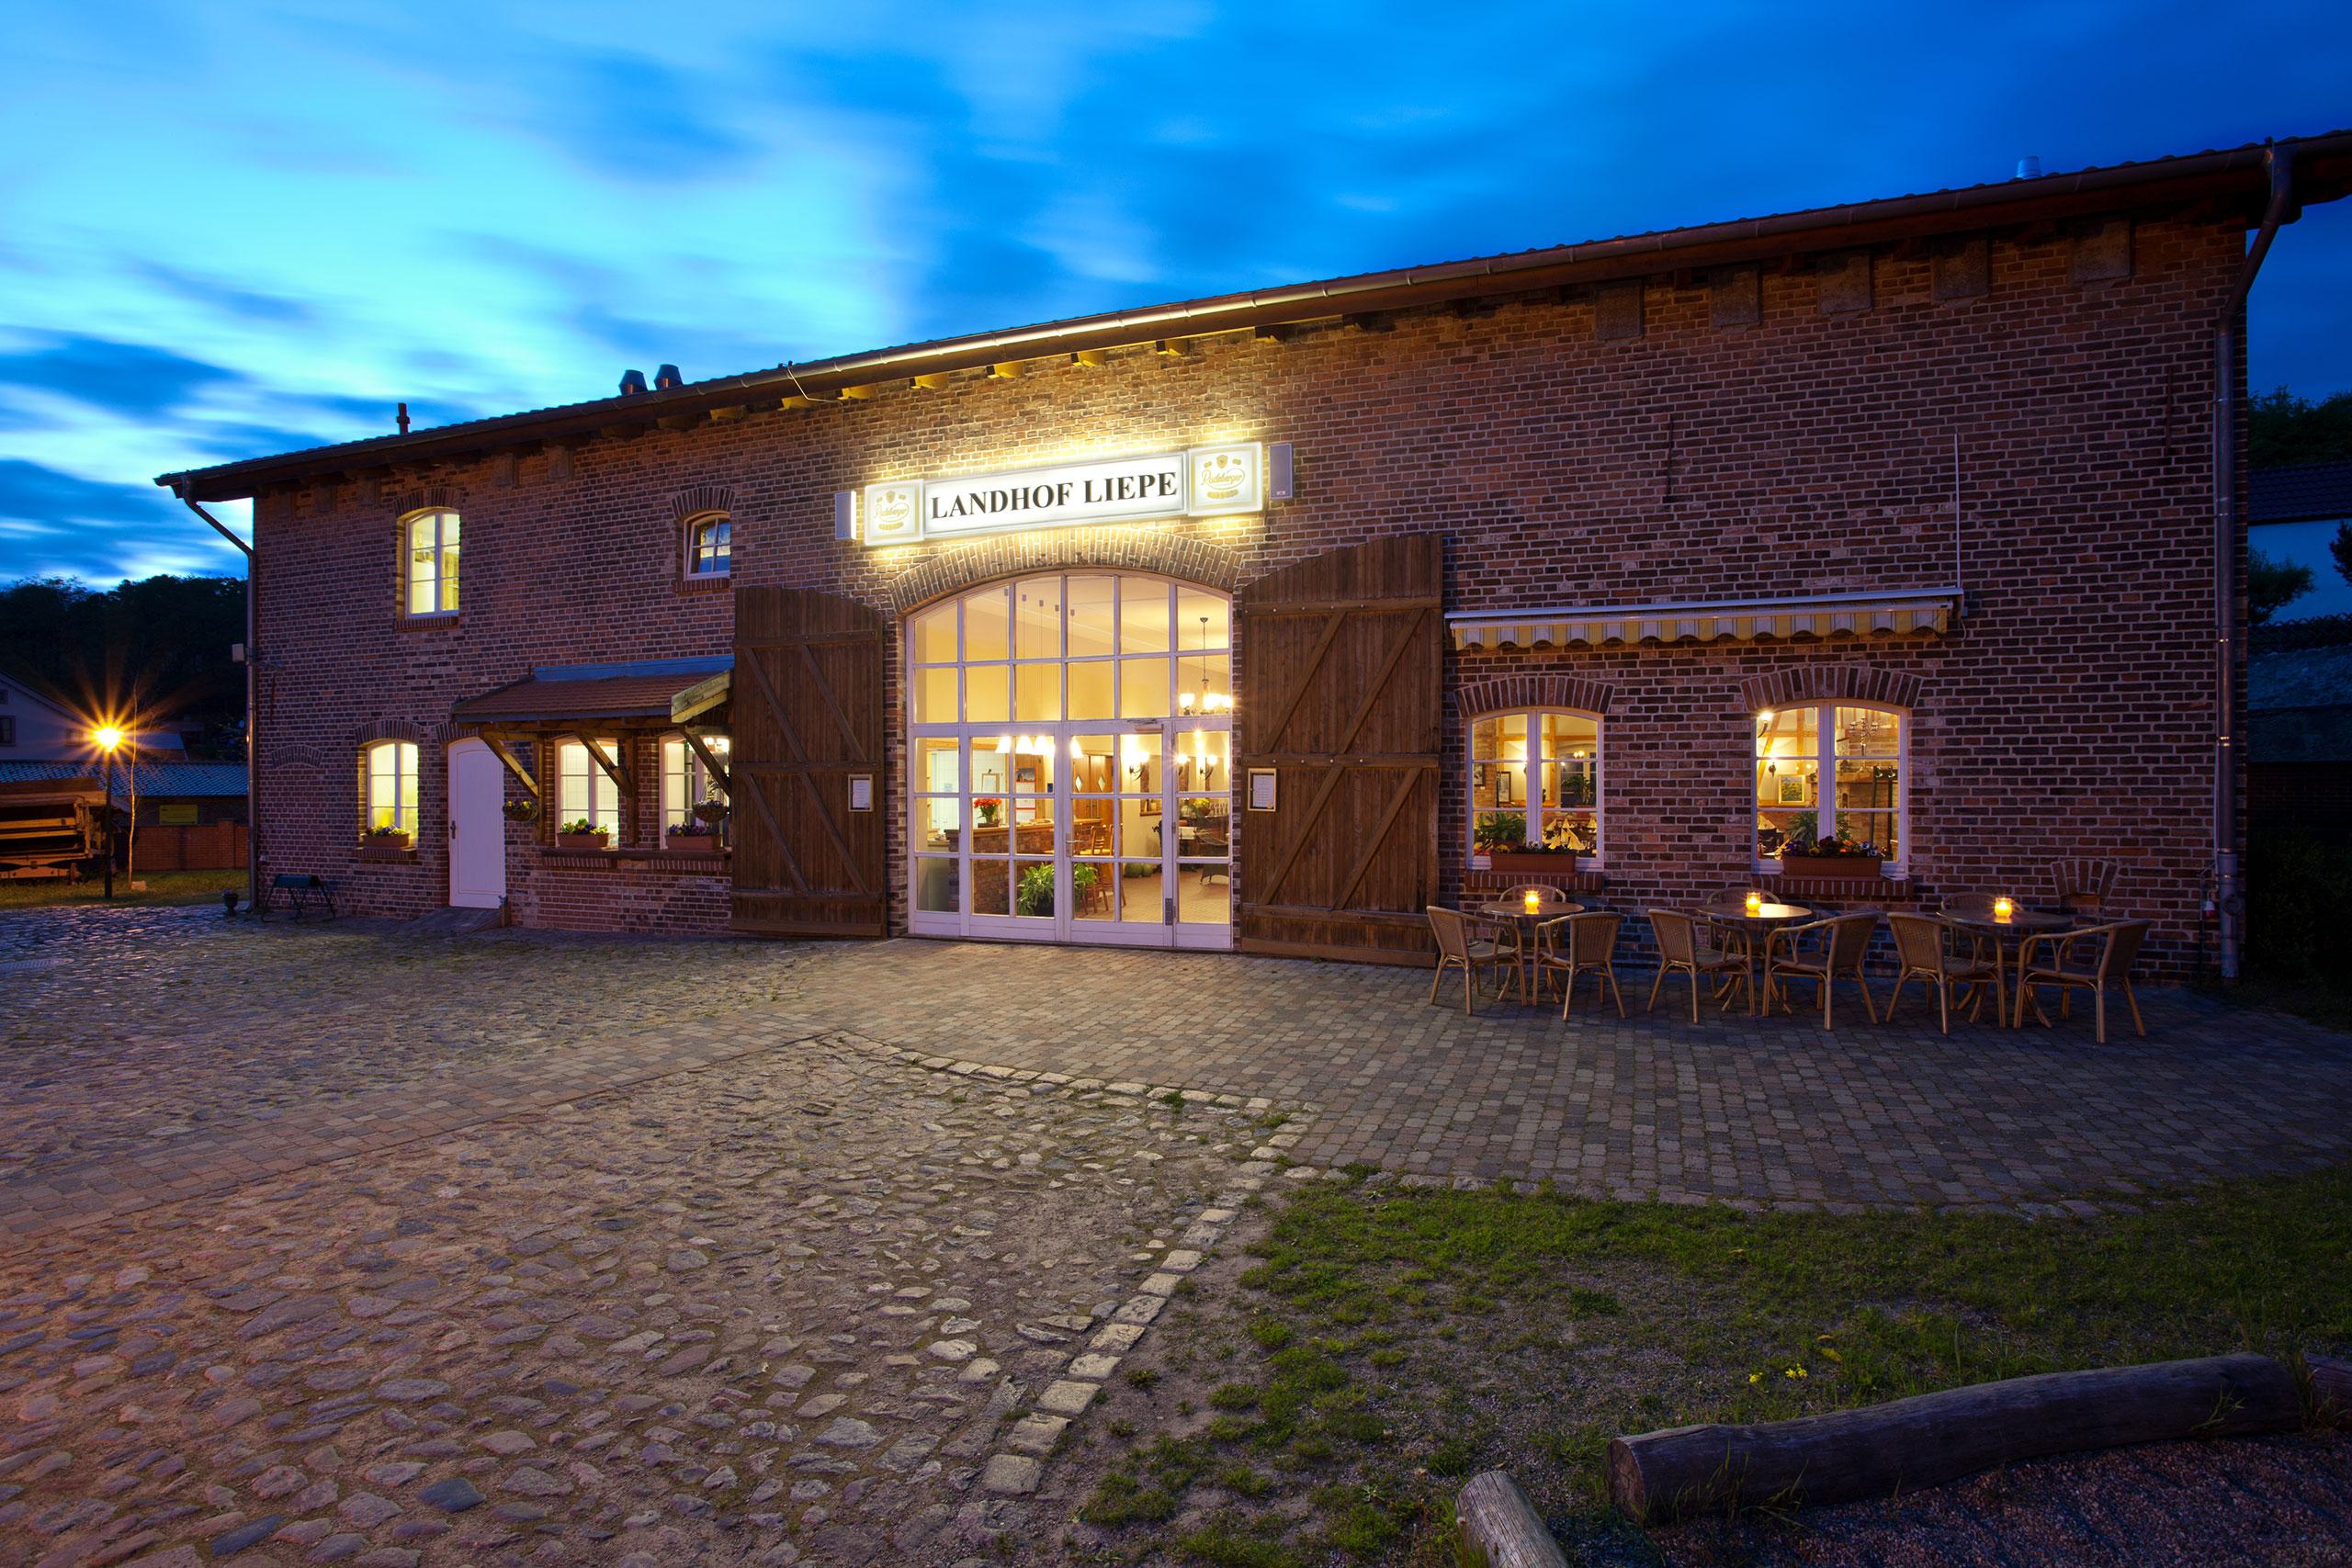 Restaurant Landhof Liepe